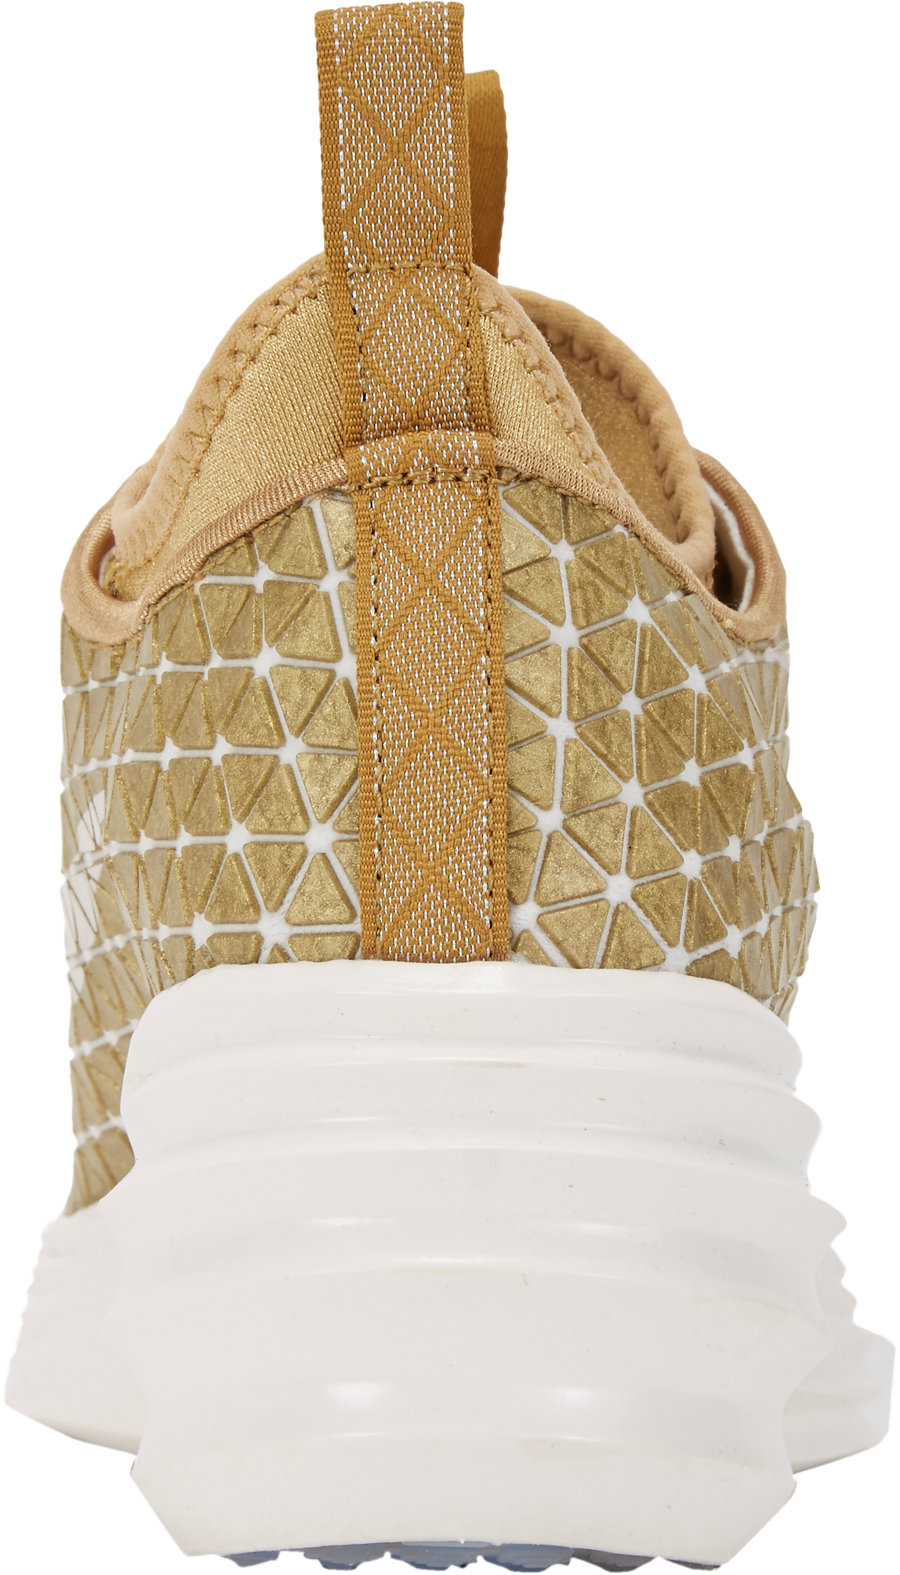 lowest price d9202 a7bea Nike Lunar Elite Sky Hi Fw Qs London Sneakers in Metallic - Lyst